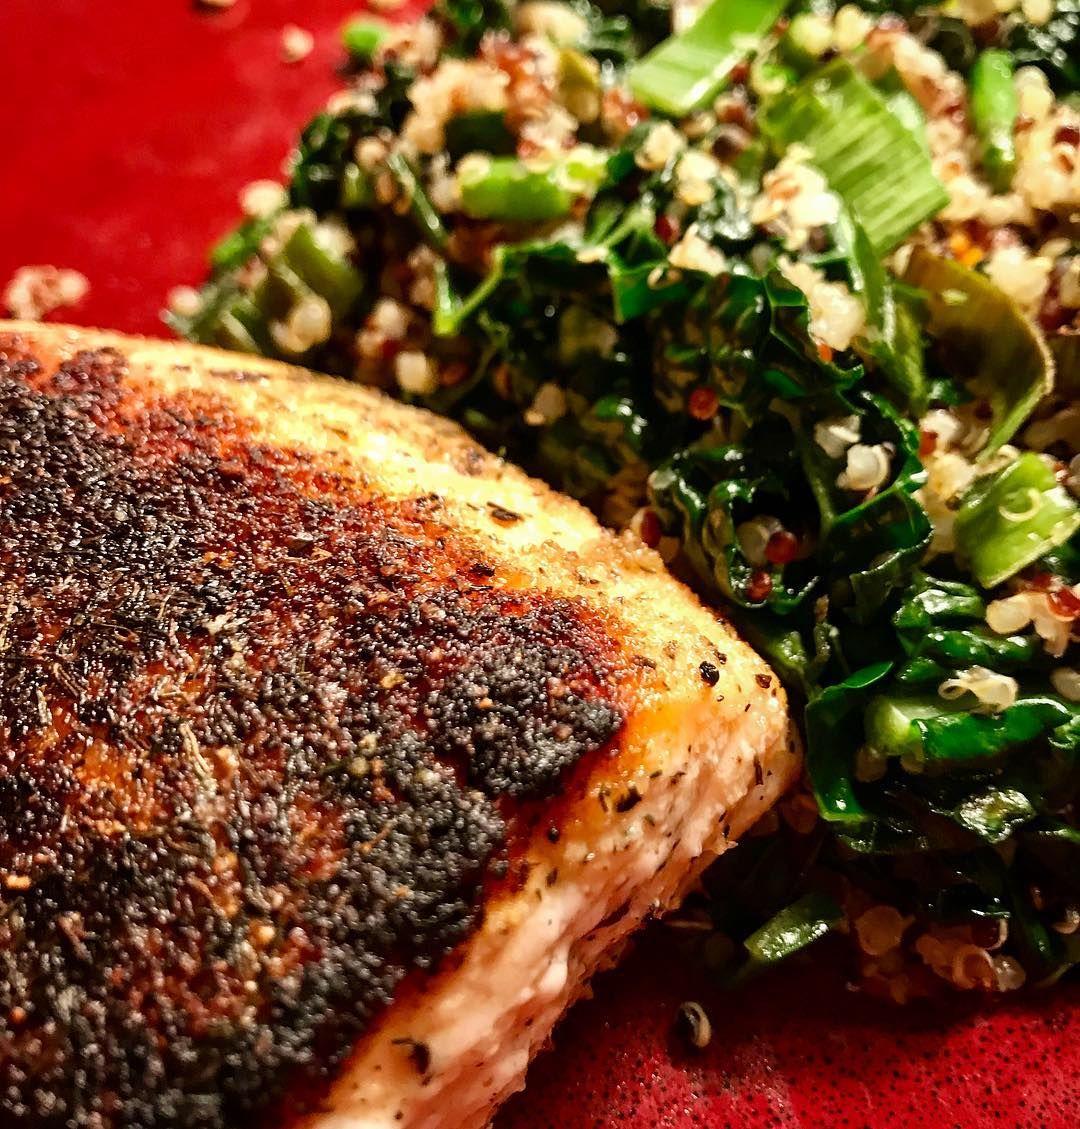 Pan seared salmon with sautéed quinoa, kale, asparagus and leeks #glutenfree #glutenfreeeats #healthyanddelicious #eatyourveggies #highproteinglutenfree #robinecoaching #quickandeasydinner #usewhatyouhave #datingmyselftonight #becreativeinthekitchen